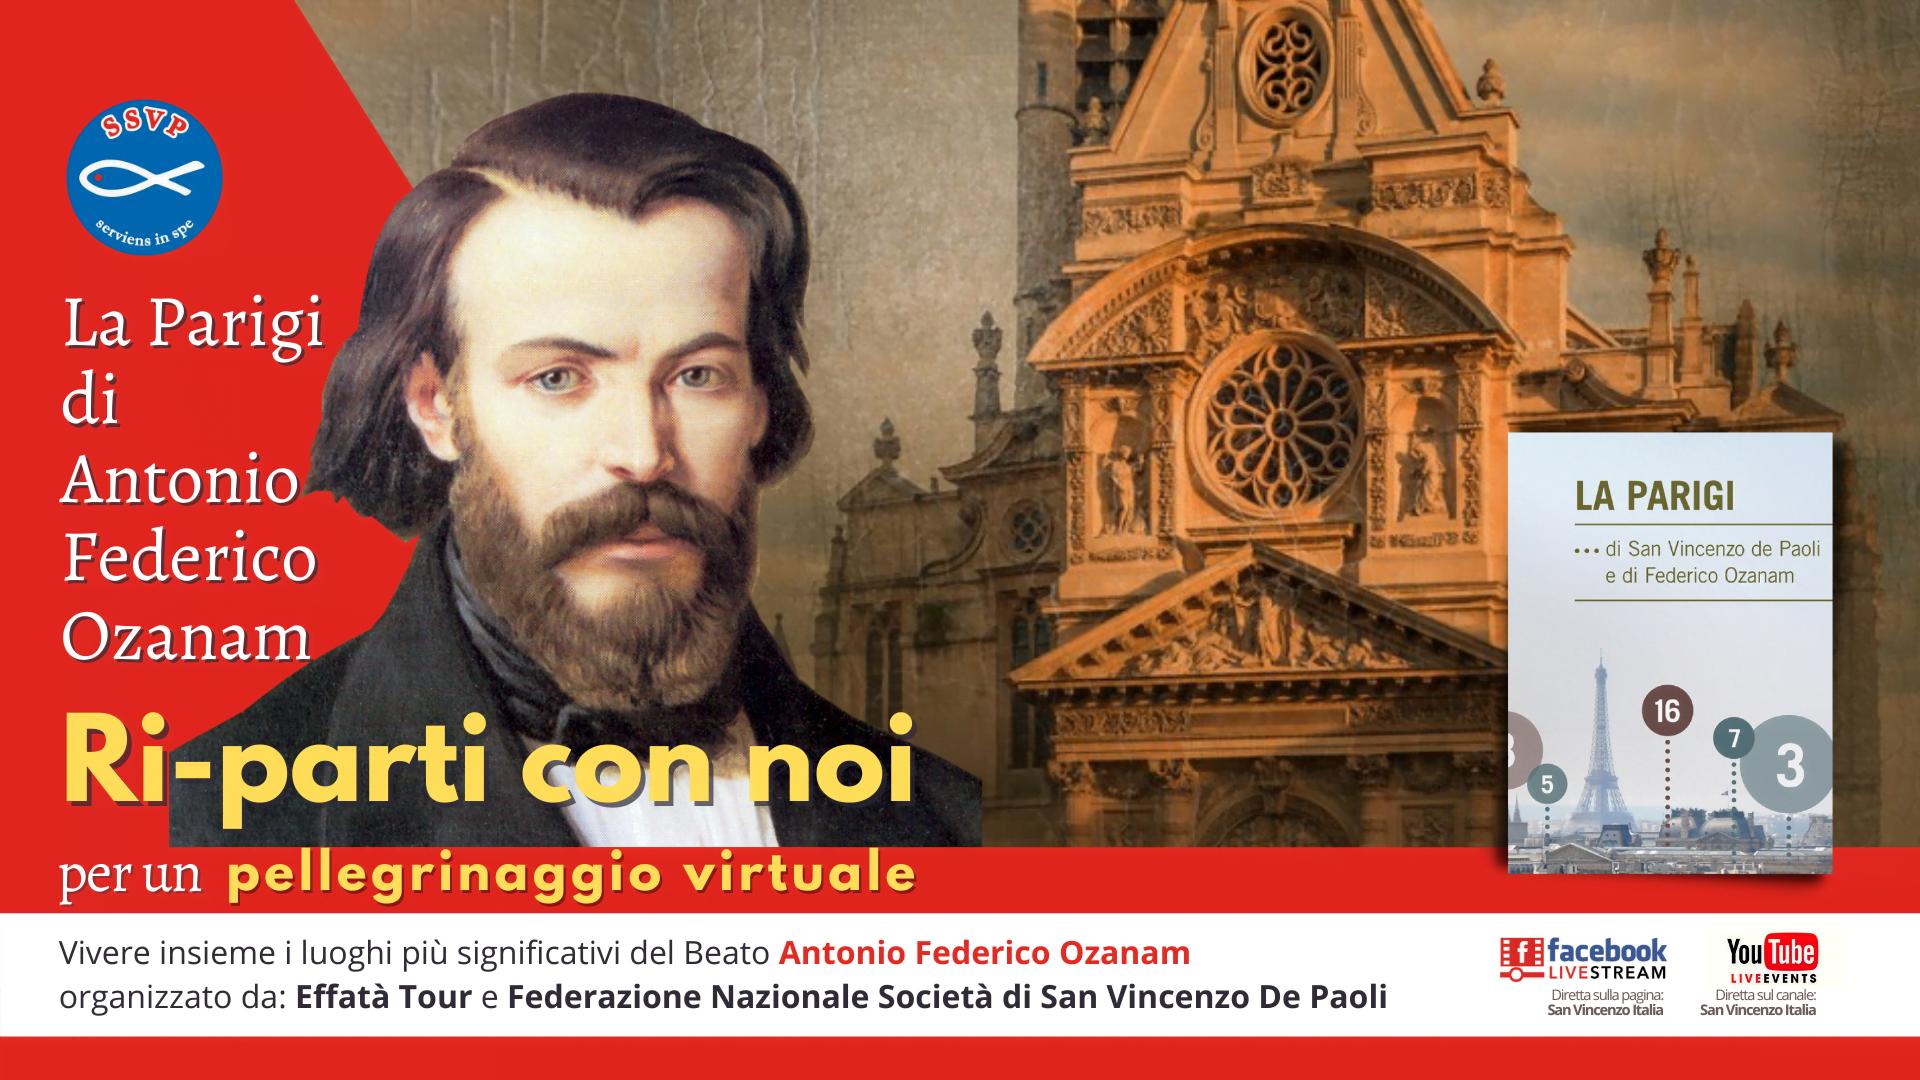 Pellegrinaggio virtuale: la Parigi di Antonio Federico Ozanam